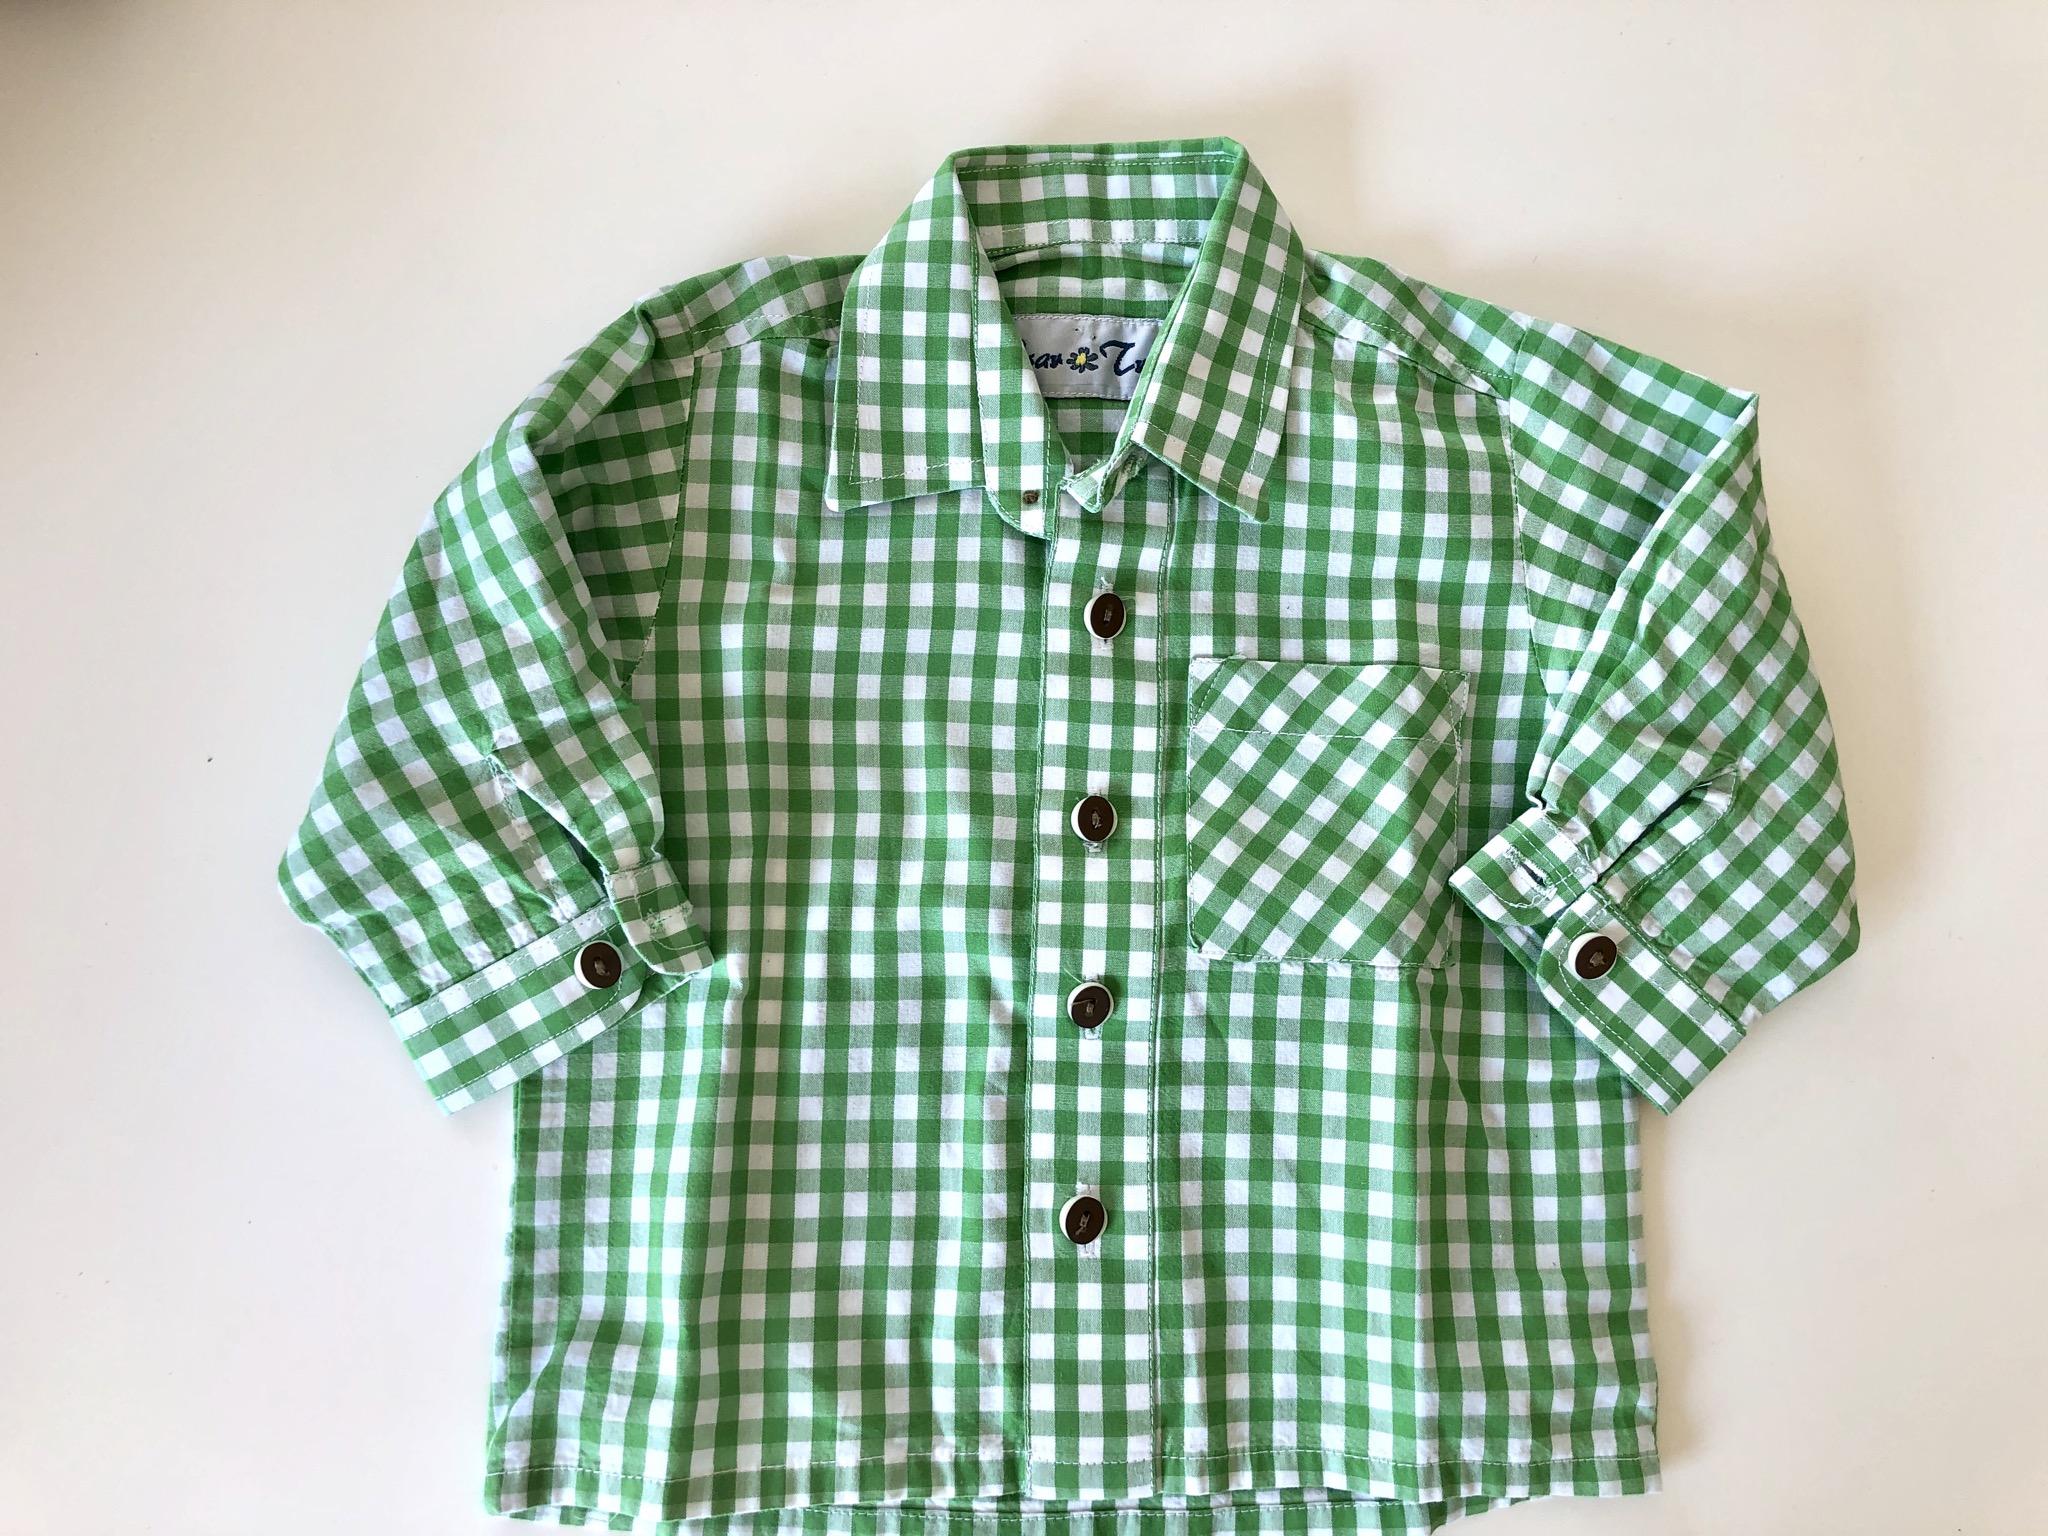 Gr. 68 Isar Trachten Trachtenhemd grün